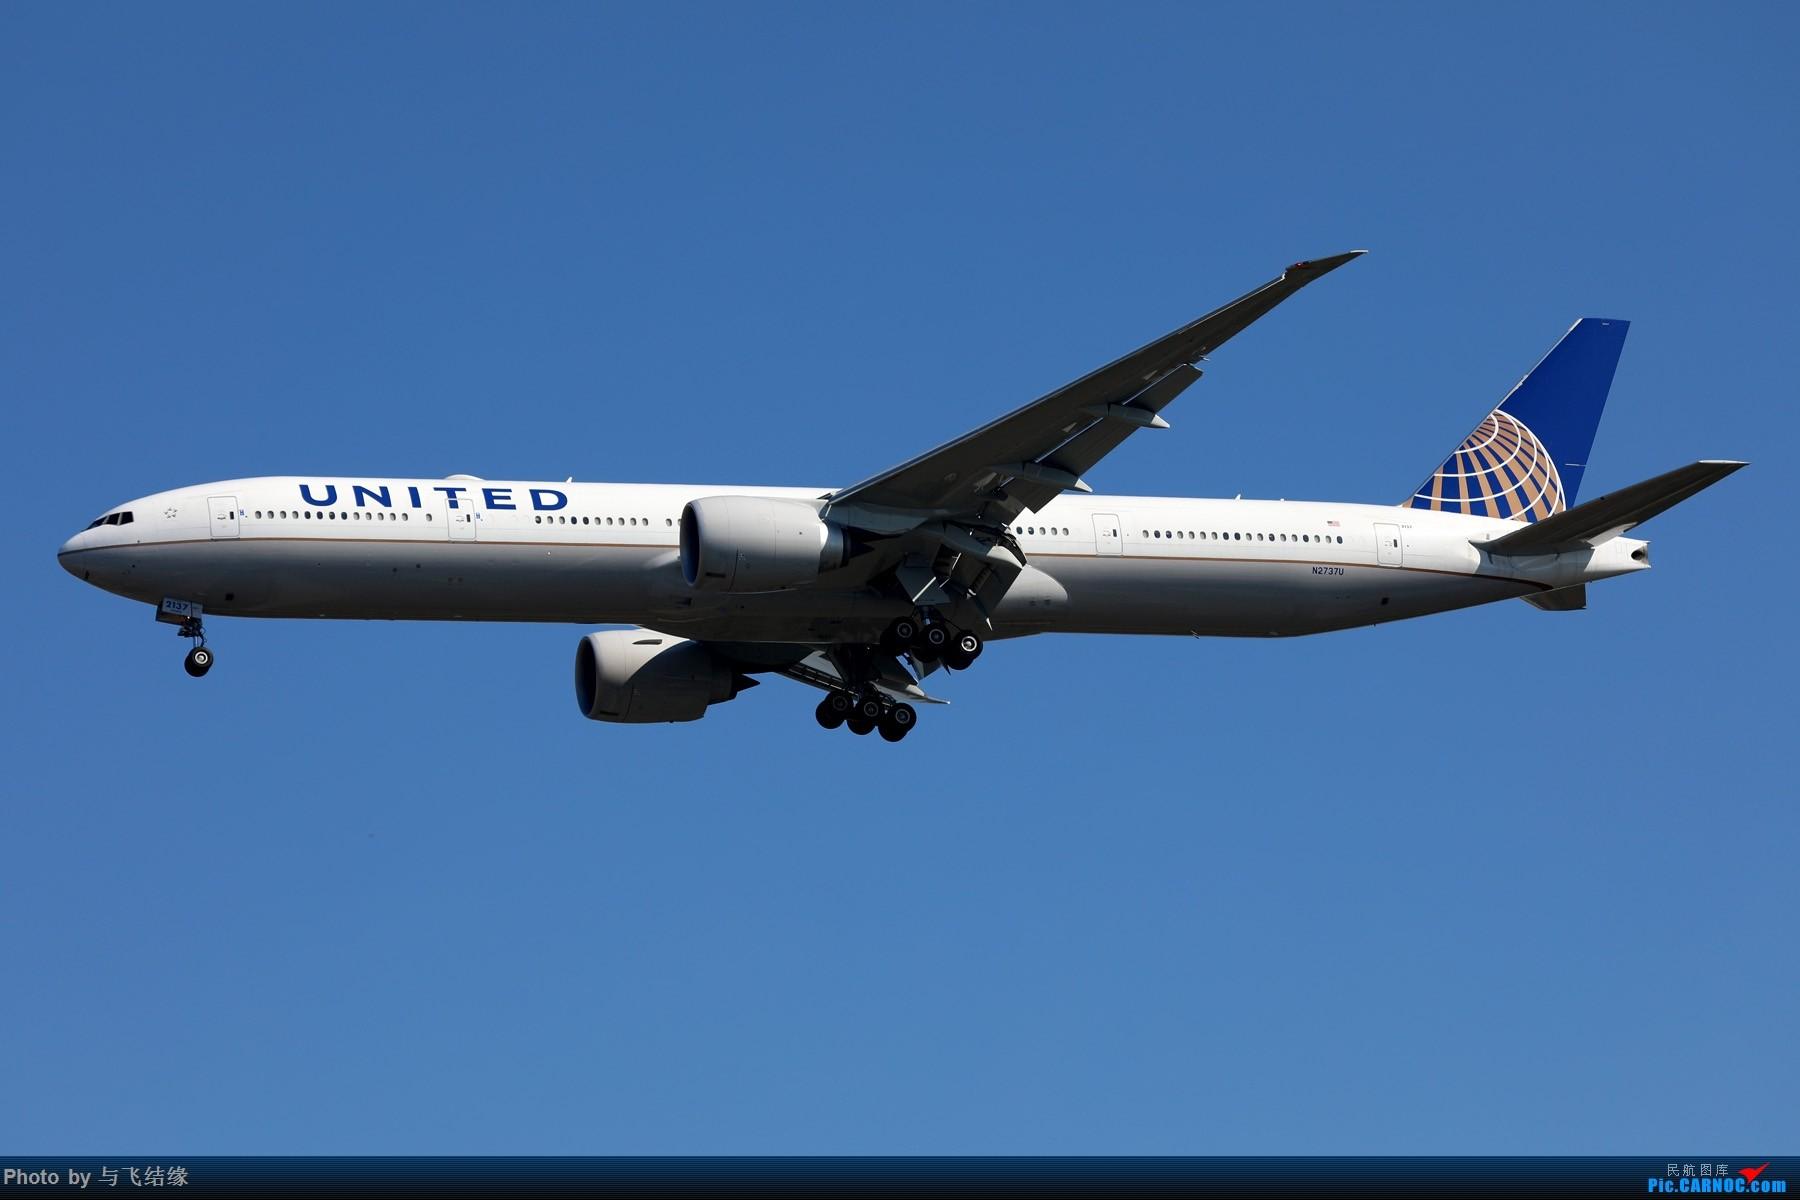 Re:[原创]波音777-300ER图一组! BOEING 777-300ER N2737U 中国北京首都国际机场